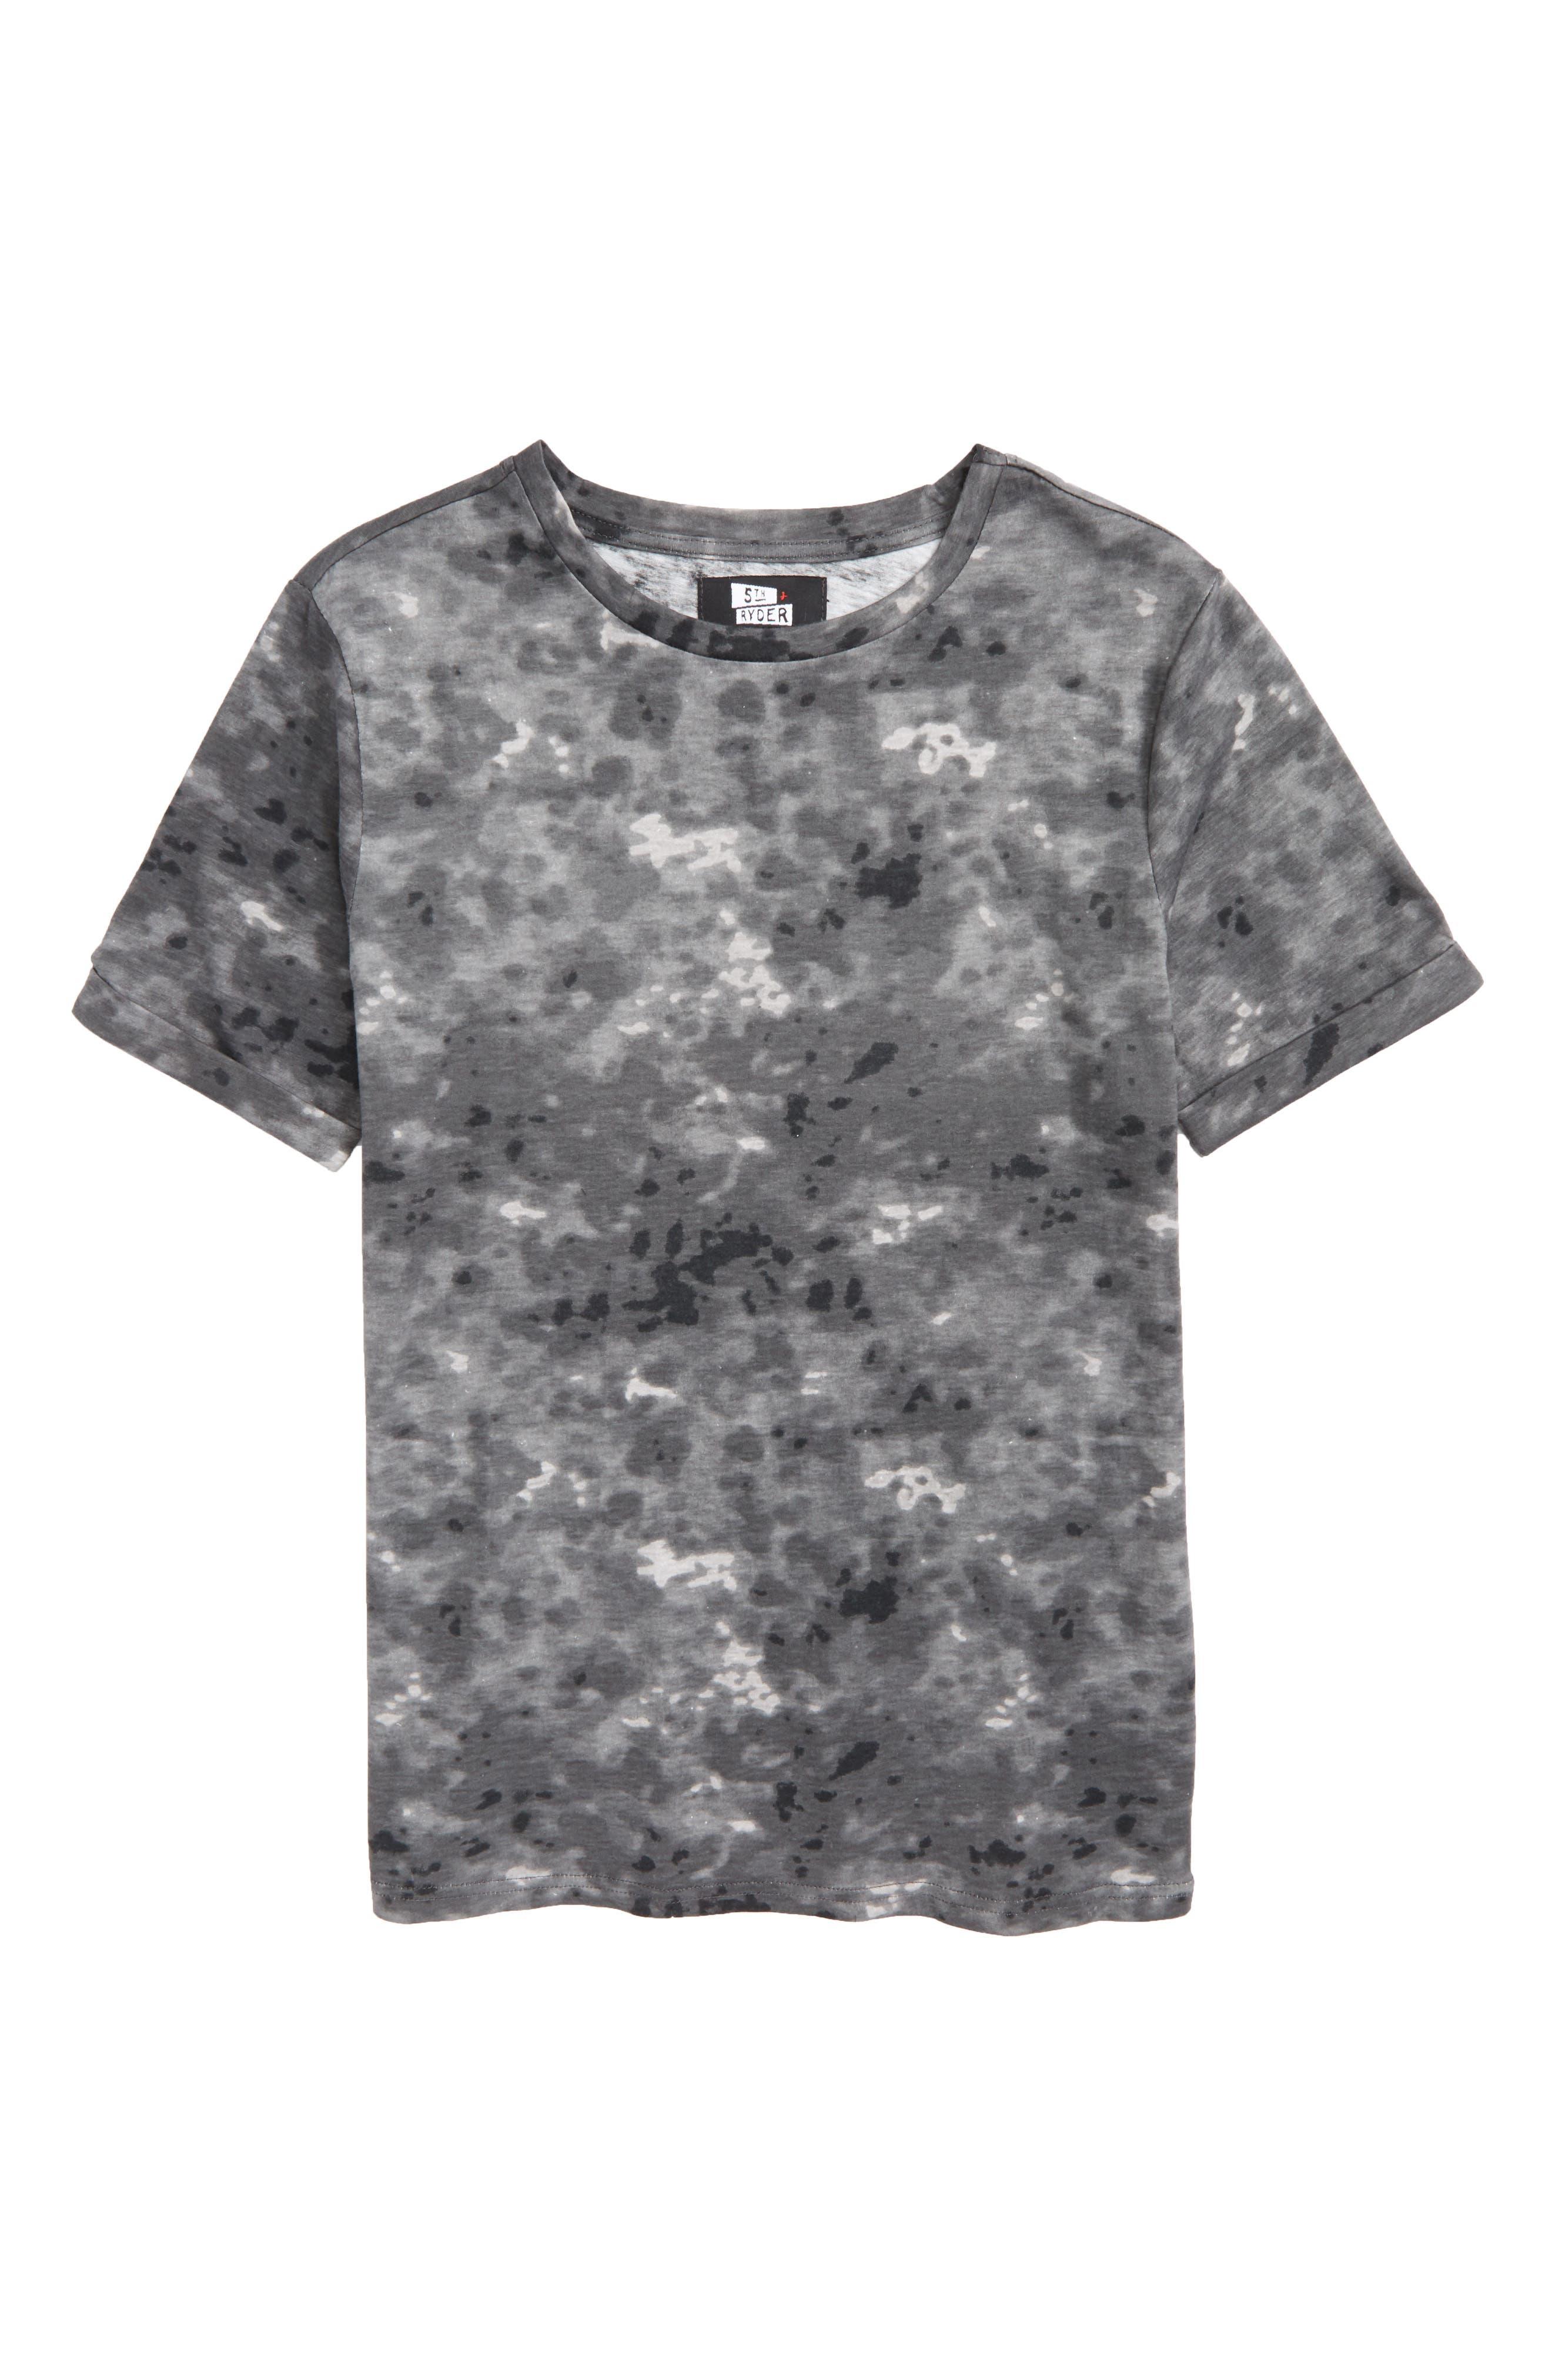 Rolled Cuff T-Shirt,                             Main thumbnail 1, color,                             Black Snow Wash Print